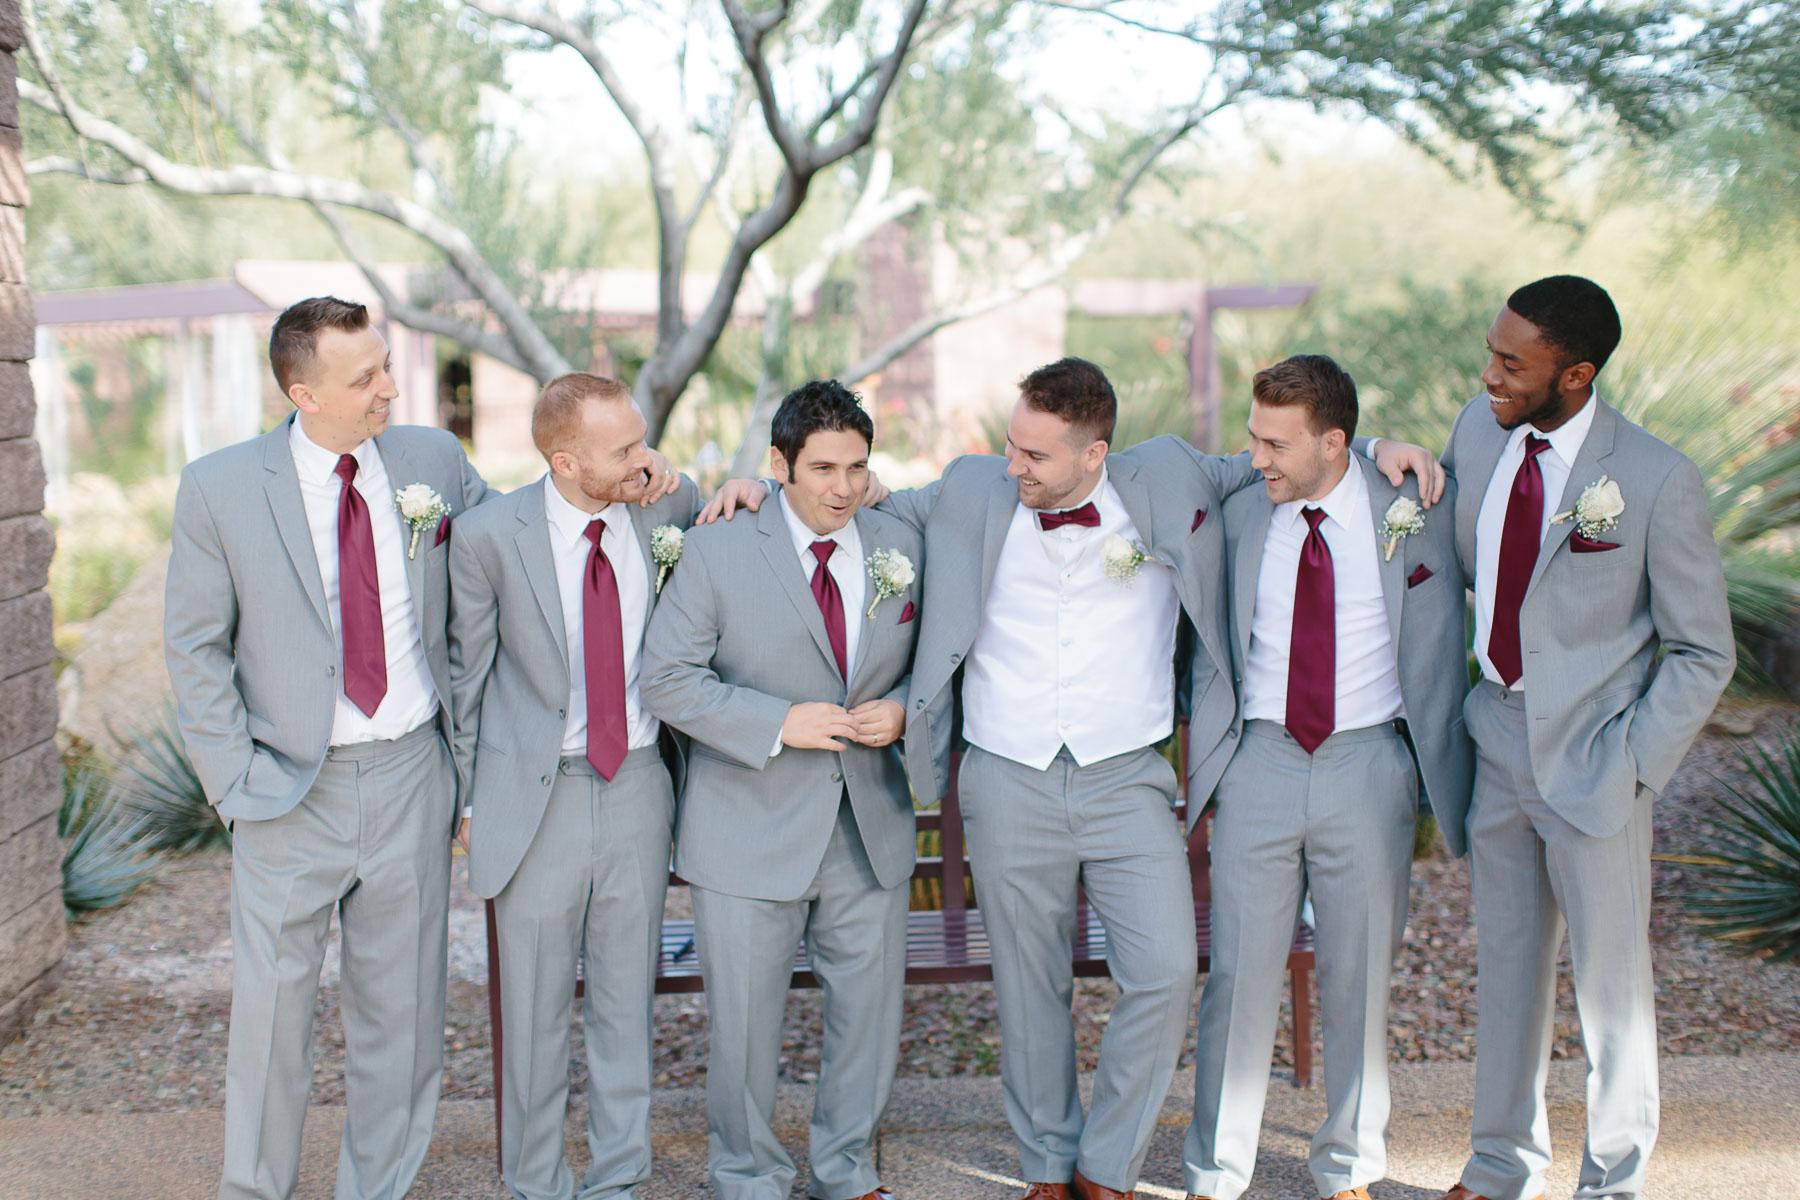 161210-Luxium-Weddings-Arizona-Matt-Jenny-Anthem-Golf-Country-Club-1005.jpg